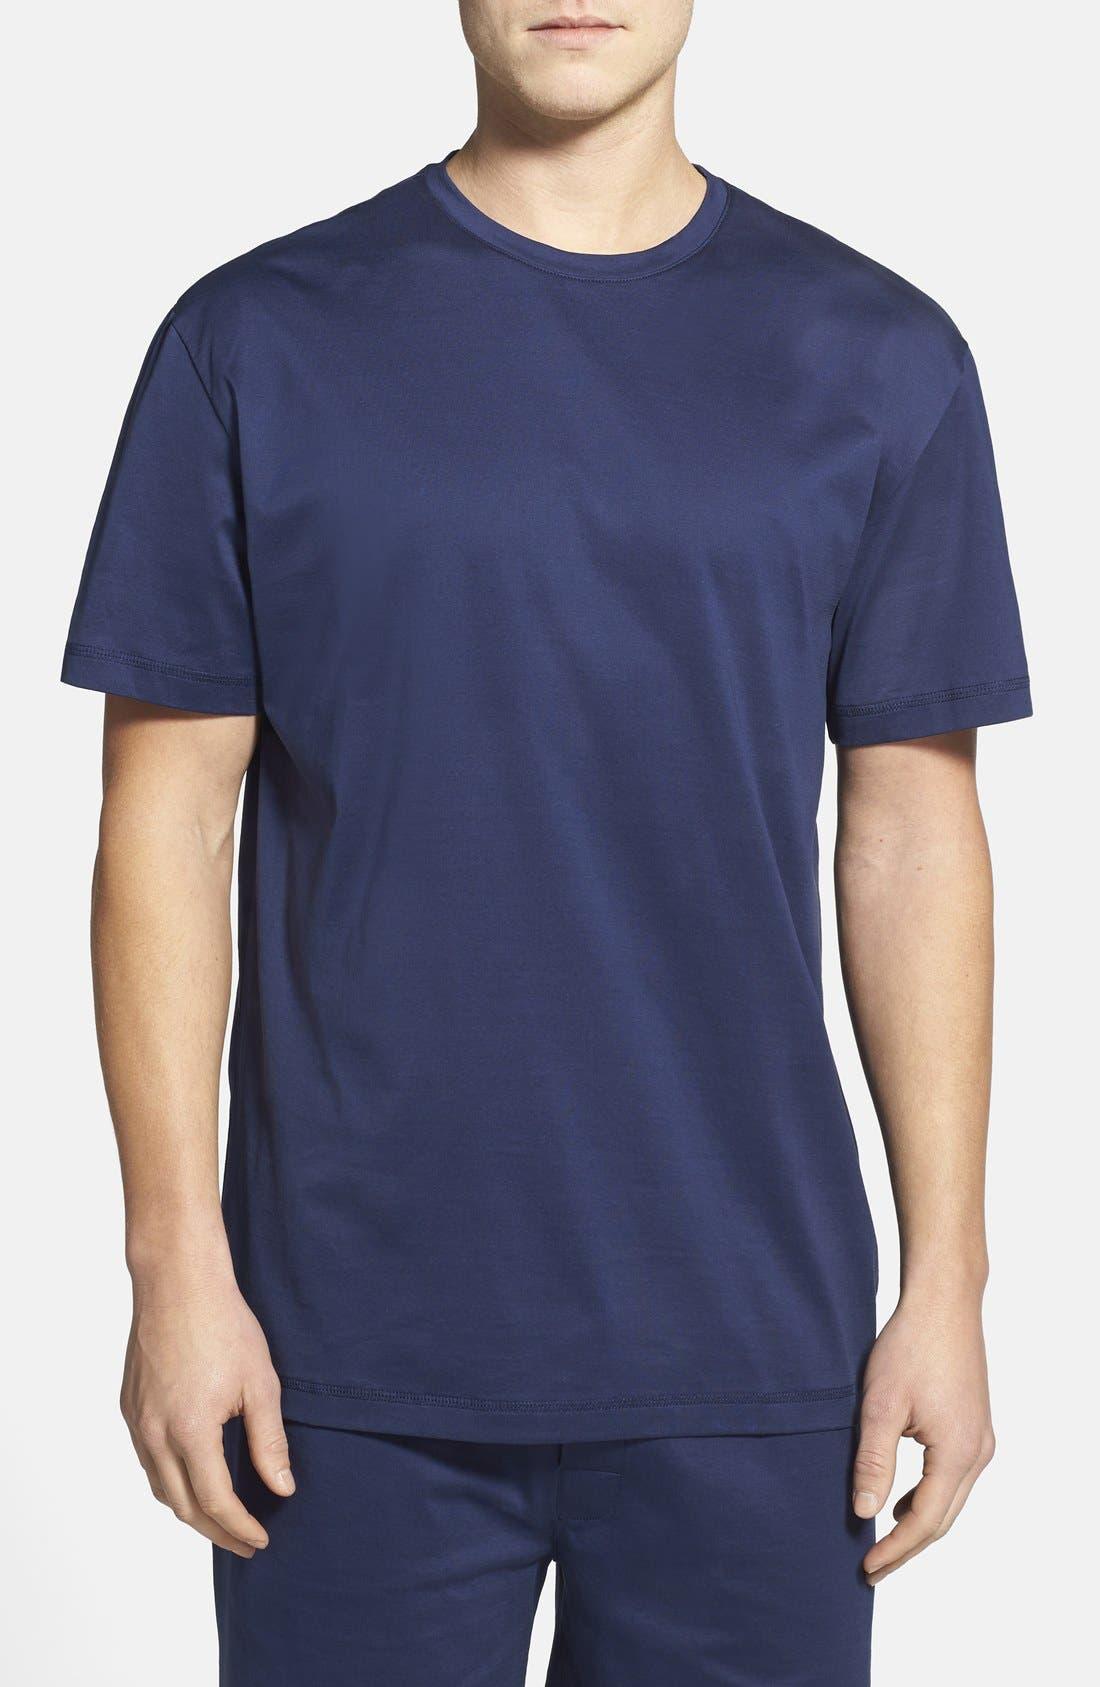 Alternate Image 1 Selected - Majestic International 'Down Time' Crewneck T-Shirt